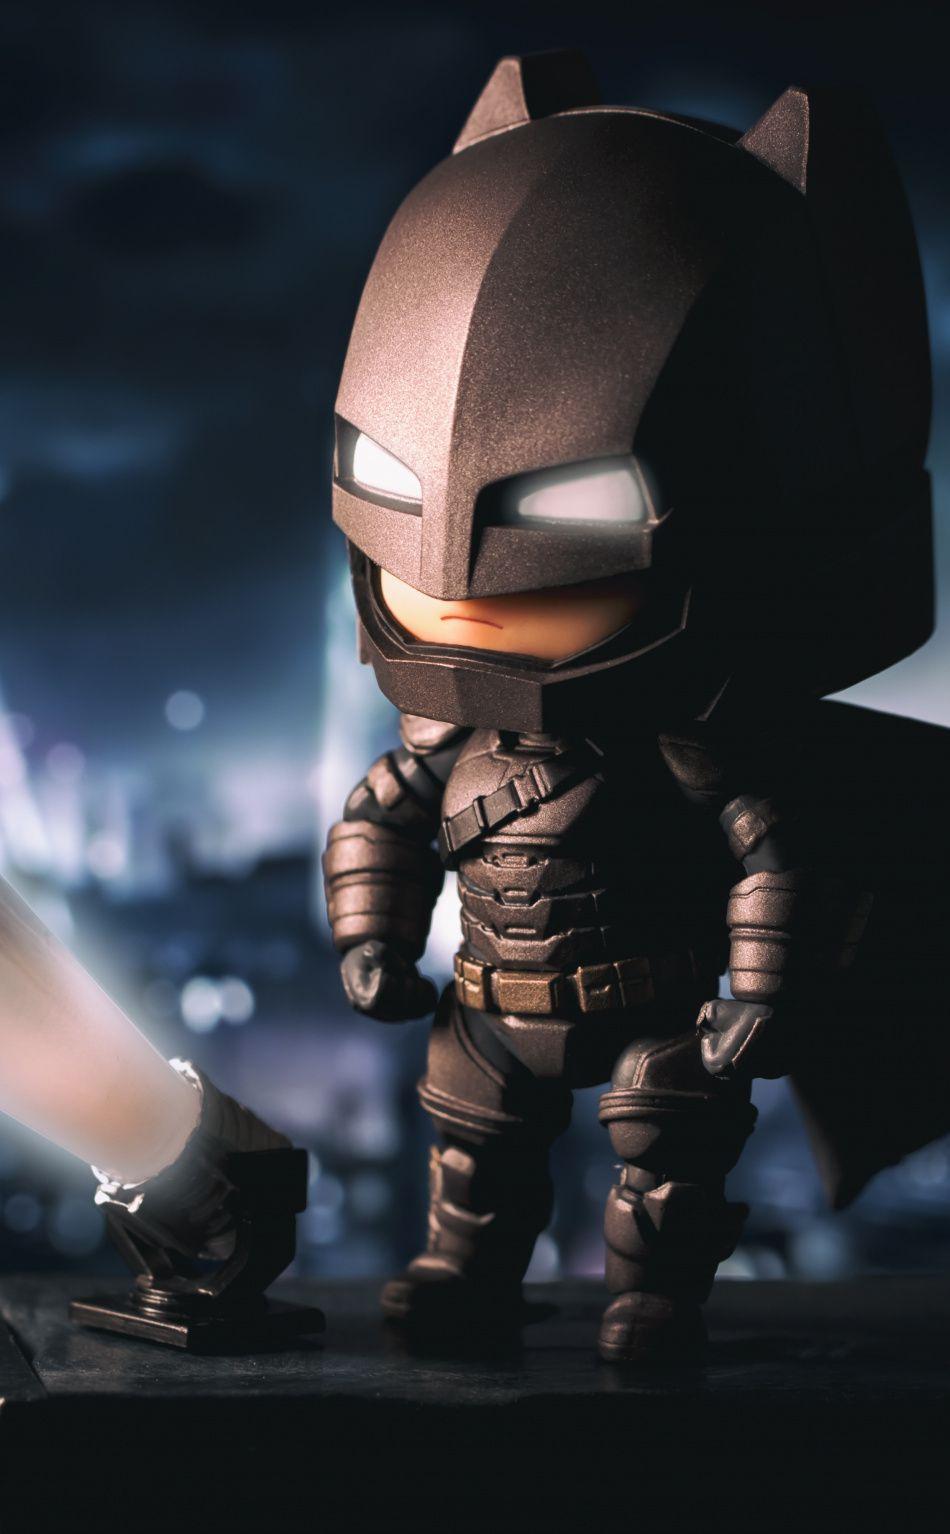 Download 950x1534 Wallpaper Batman The Bat Signal Lego Figure Toy Iphone 950x1534 Hd Image Background 8552 Superhero Batman Batman Wallpaper